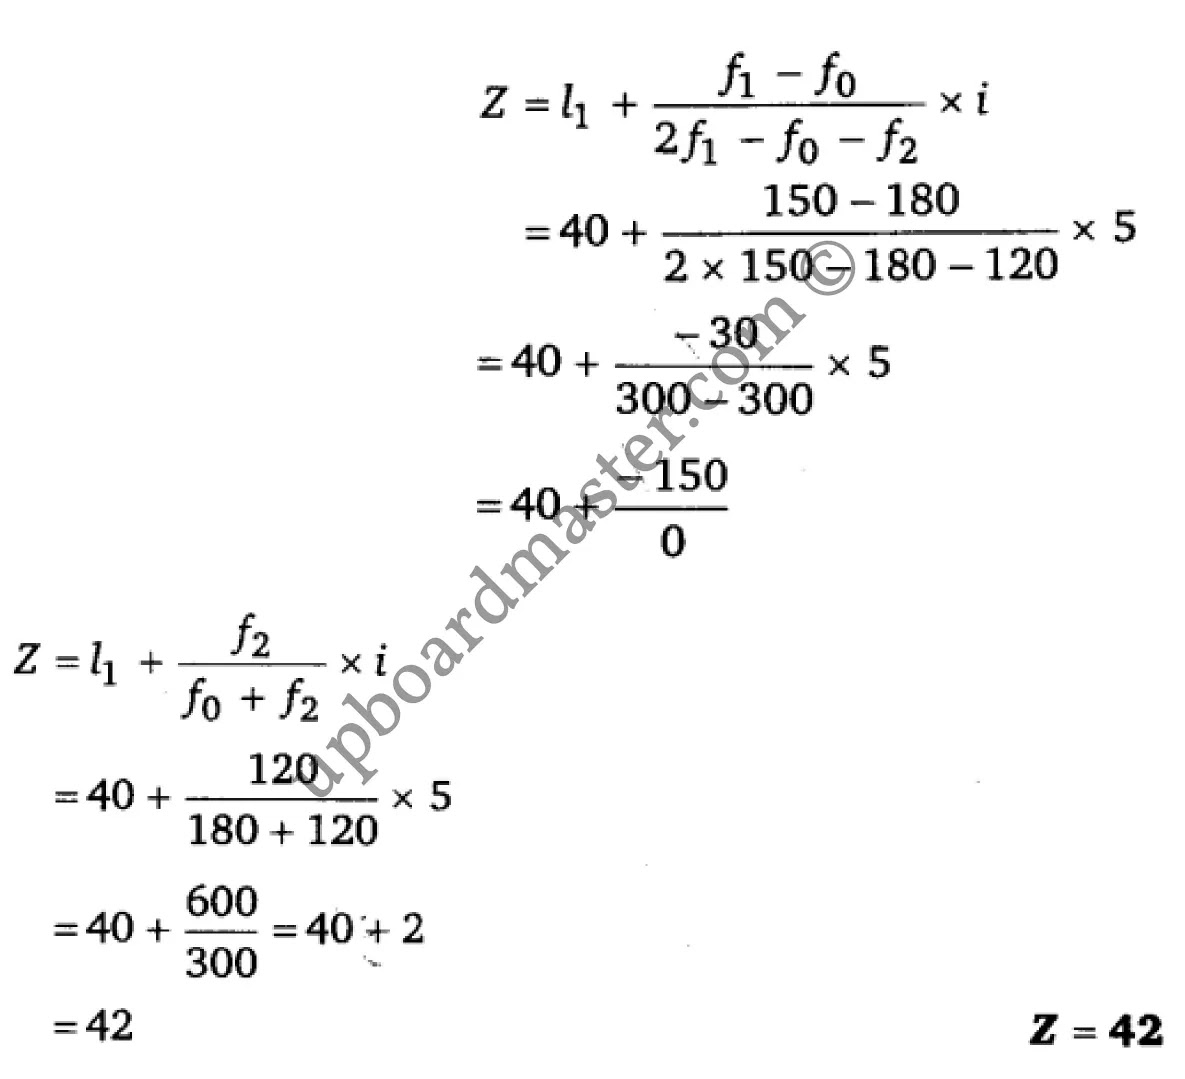 कक्षा 11 अर्थशास्त्र  सांख्यिकी अध्याय 5  के नोट्स  हिंदी में एनसीईआरटी समाधान,     class 11 Economics chapter 5,   class 11 Economics chapter 5 ncert solutions in Economics,  class 11 Economics chapter 5 notes in hindi,   class 11 Economics chapter 5 question answer,   class 11 Economics chapter 5 notes,   class 11 Economics chapter 5 class 11 Economics  chapter 5 in  hindi,    class 11 Economics chapter 5 important questions in  hindi,   class 11 Economics hindi  chapter 5 notes in hindi,   class 11 Economics  chapter 5 test,   class 11 Economics  chapter 5 class 11 Economics  chapter 5 pdf,   class 11 Economics  chapter 5 notes pdf,   class 11 Economics  chapter 5 exercise solutions,  class 11 Economics  chapter 5,  class 11 Economics  chapter 5 notes study rankers,  class 11 Economics  chapter 5 notes,   class 11 Economics hindi  chapter 5 notes,    class 11 Economics   chapter 5  class 11  notes pdf,  class 11 Economics  chapter 5 class 11  notes  ncert,  class 11 Economics  chapter 5 class 11 pdf,   class 11 Economics  chapter 5  book,   class 11 Economics  chapter 5 quiz class 11  ,    11  th class 11 Economics chapter 5  book up board,   up board 11  th class 11 Economics chapter 5 notes,  class 11 Economics  Statistics for Economics chapter 5,   class 11 Economics  Statistics for Economics chapter 5 ncert solutions in Economics,   class 11 Economics  Statistics for Economics chapter 5 notes in hindi,   class 11 Economics  Statistics for Economics chapter 5 question answer,   class 11 Economics  Statistics for Economics  chapter 5 notes,  class 11 Economics  Statistics for Economics  chapter 5 class 11 Economics  chapter 5 in  hindi,    class 11 Economics  Statistics for Economics chapter 5 important questions in  hindi,   class 11 Economics  Statistics for Economics  chapter 5 notes in hindi,    class 11 Economics  Statistics for Economics  chapter 5 test,  class 11 Economics  Statistics for Economics  chapter 5 class 11 Economics  chapter 5 pdf,   class 11